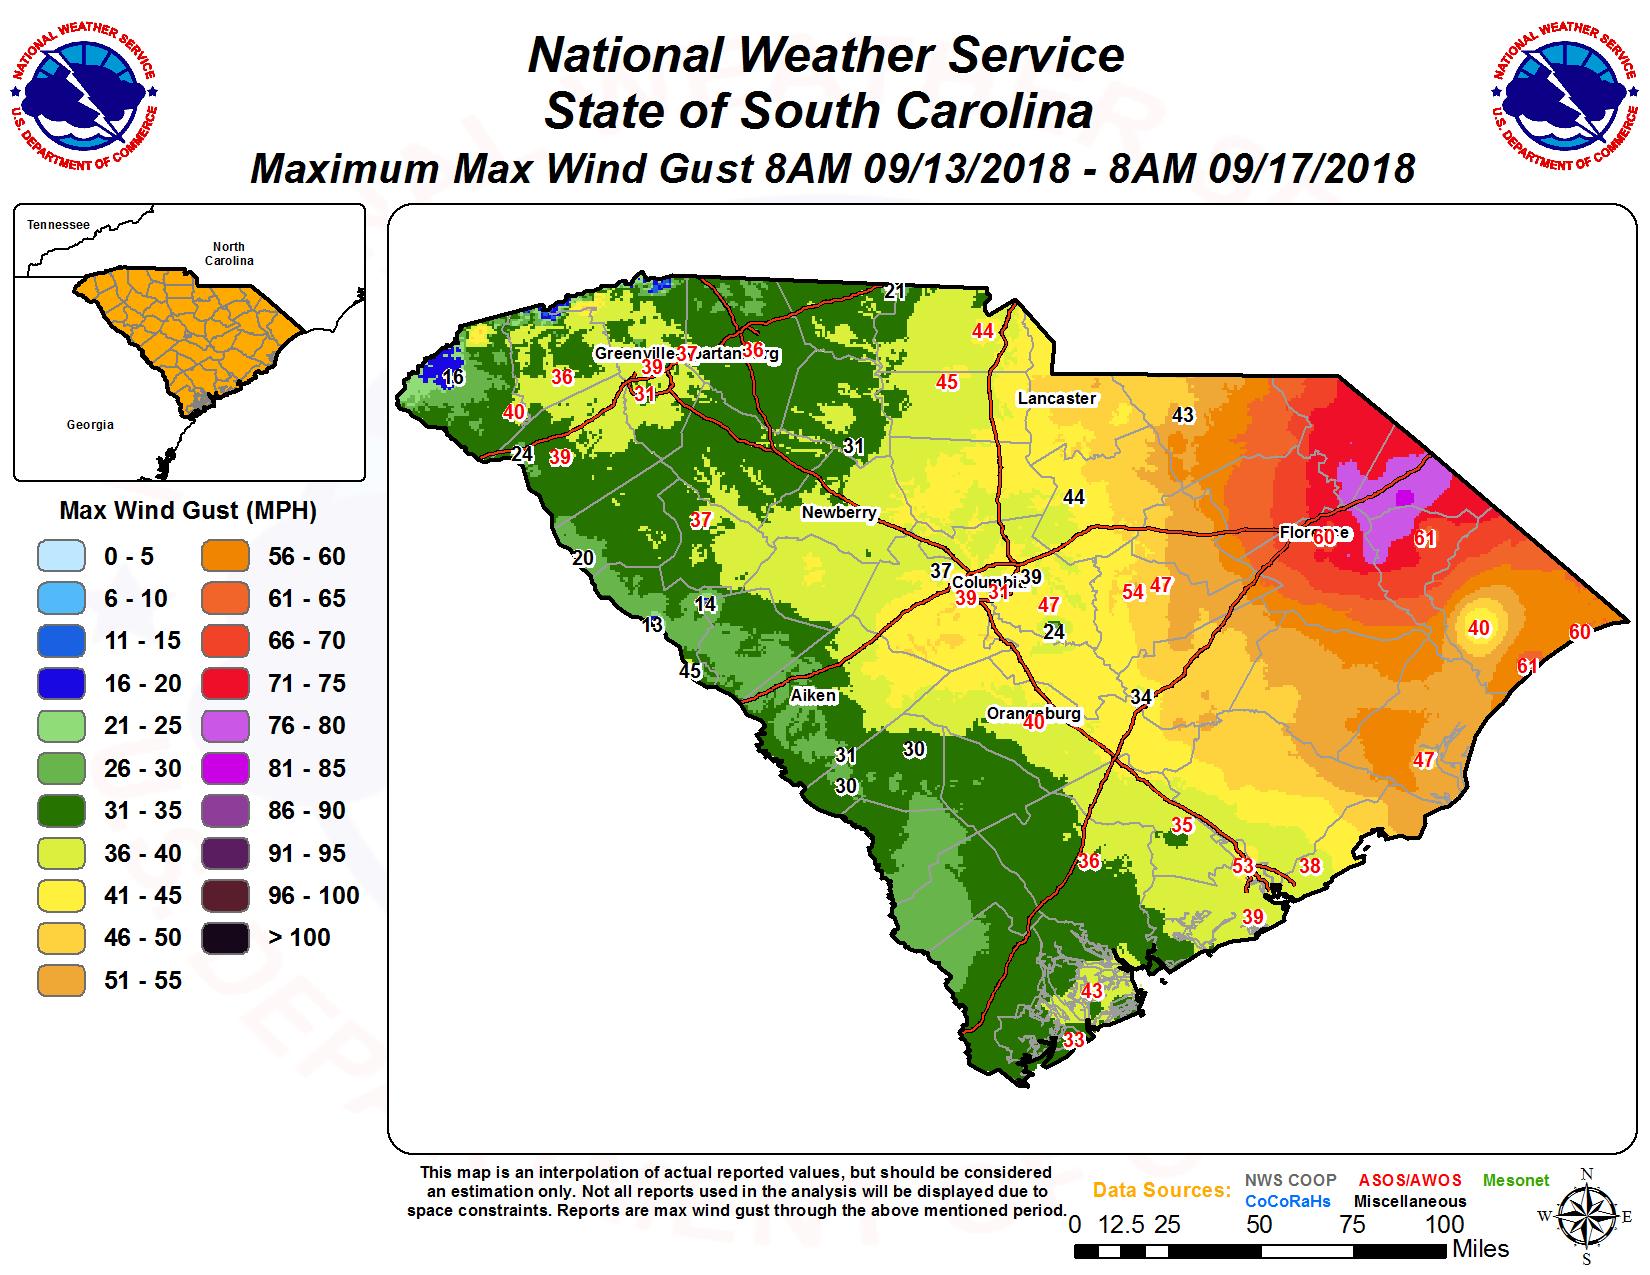 South Carolina Weather Map Tropical Storm Florence   September 14 15, 2018